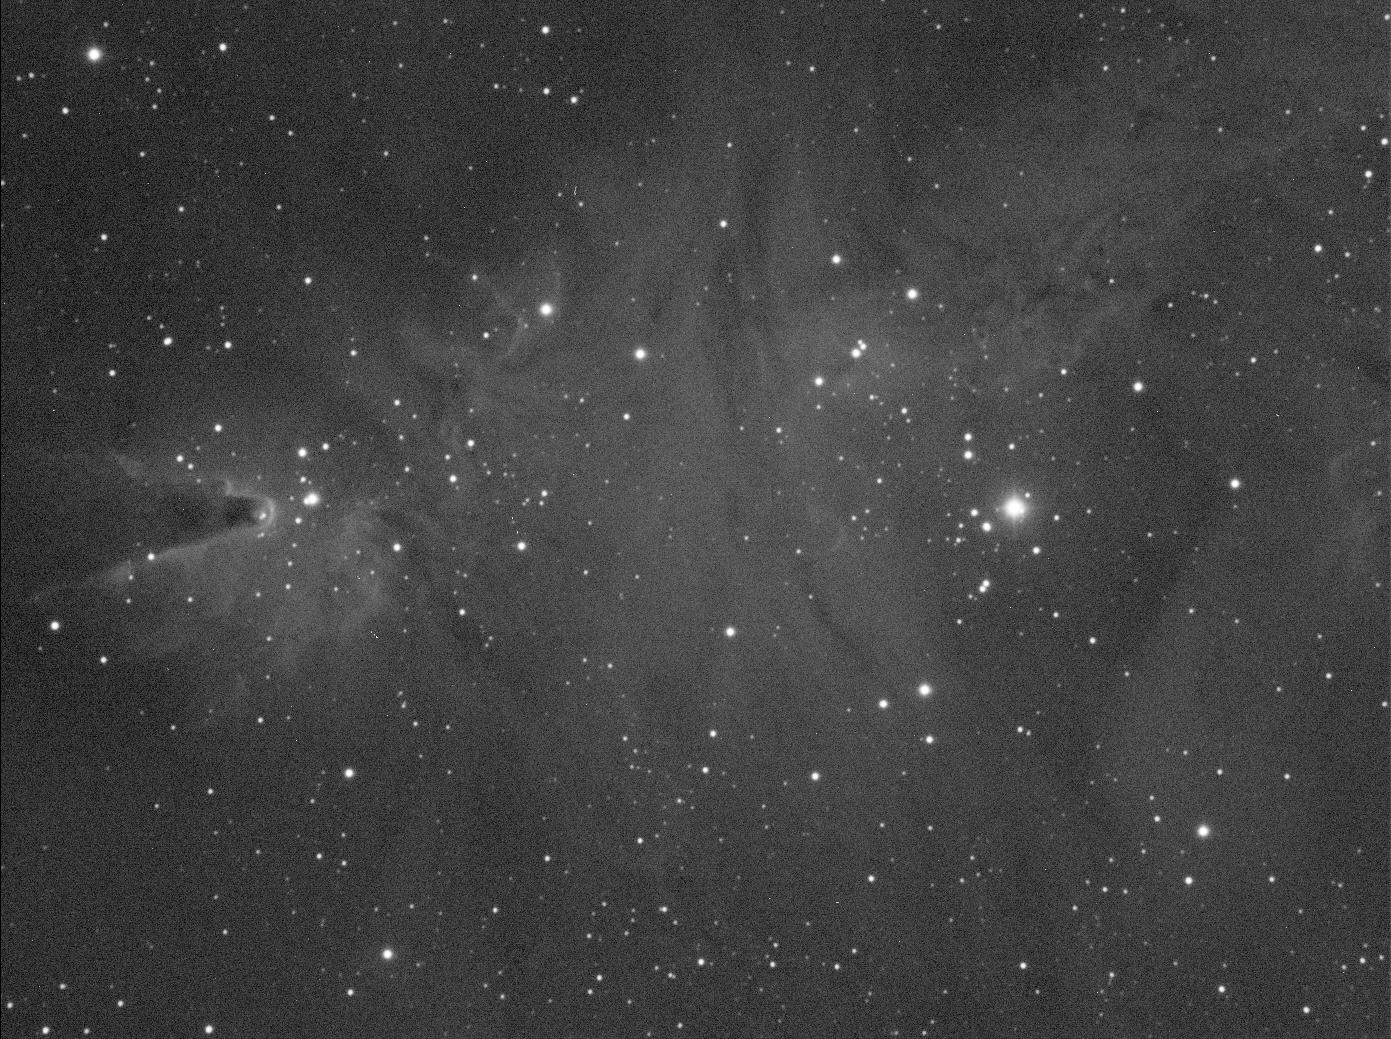 NGC2264_HII_600s.png.5b1f23bc79224c2cd4c91e98e659666c.png